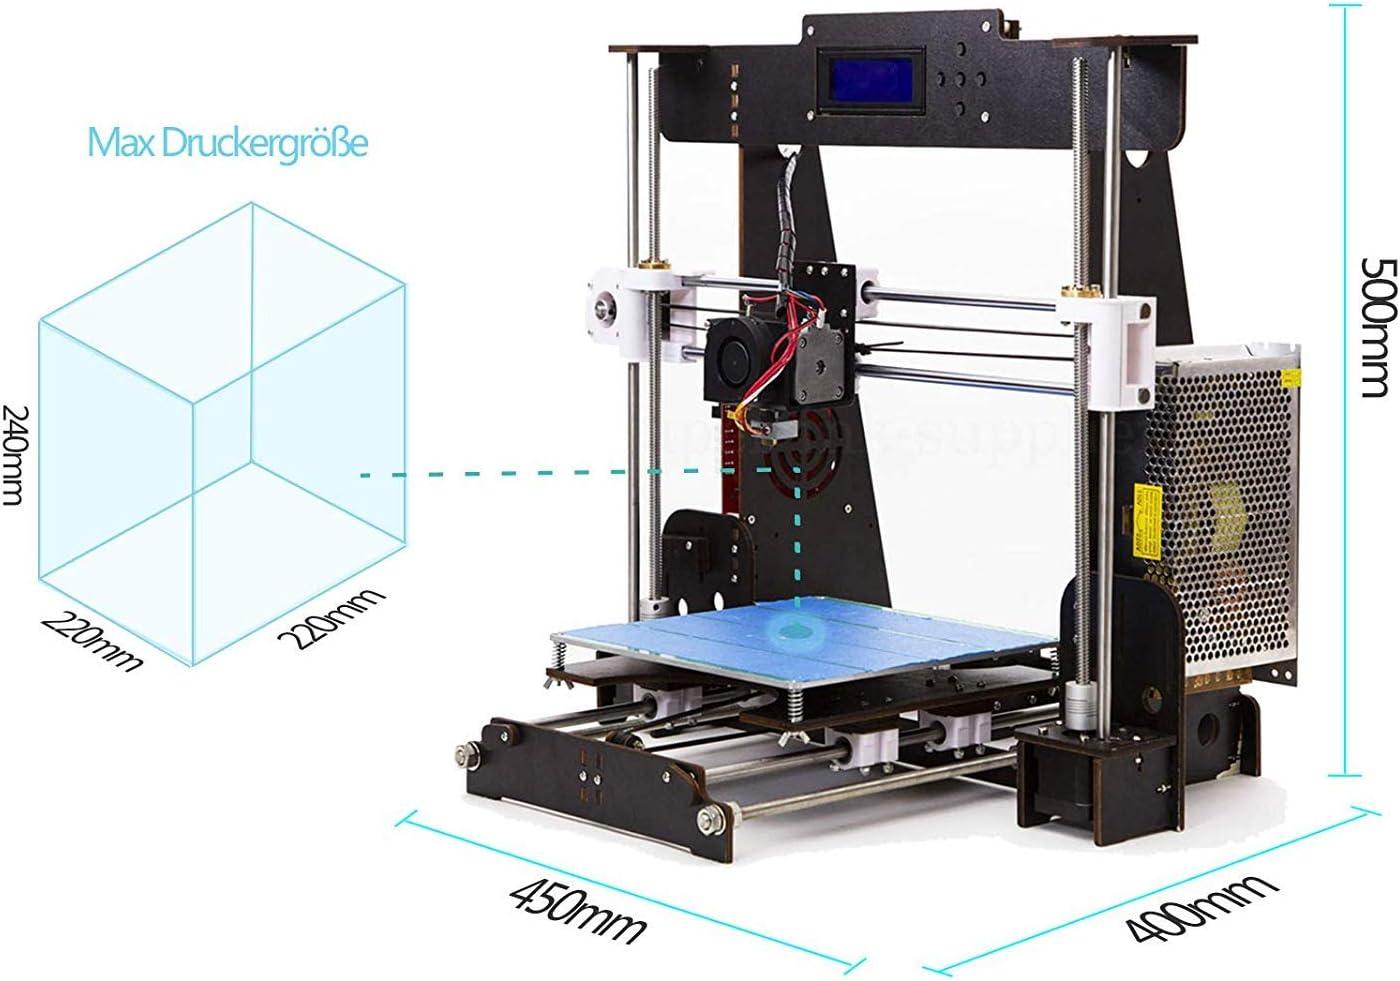 Win-Tinten A8 Madera Upgrade High Precision 3D Printer Reprap ...